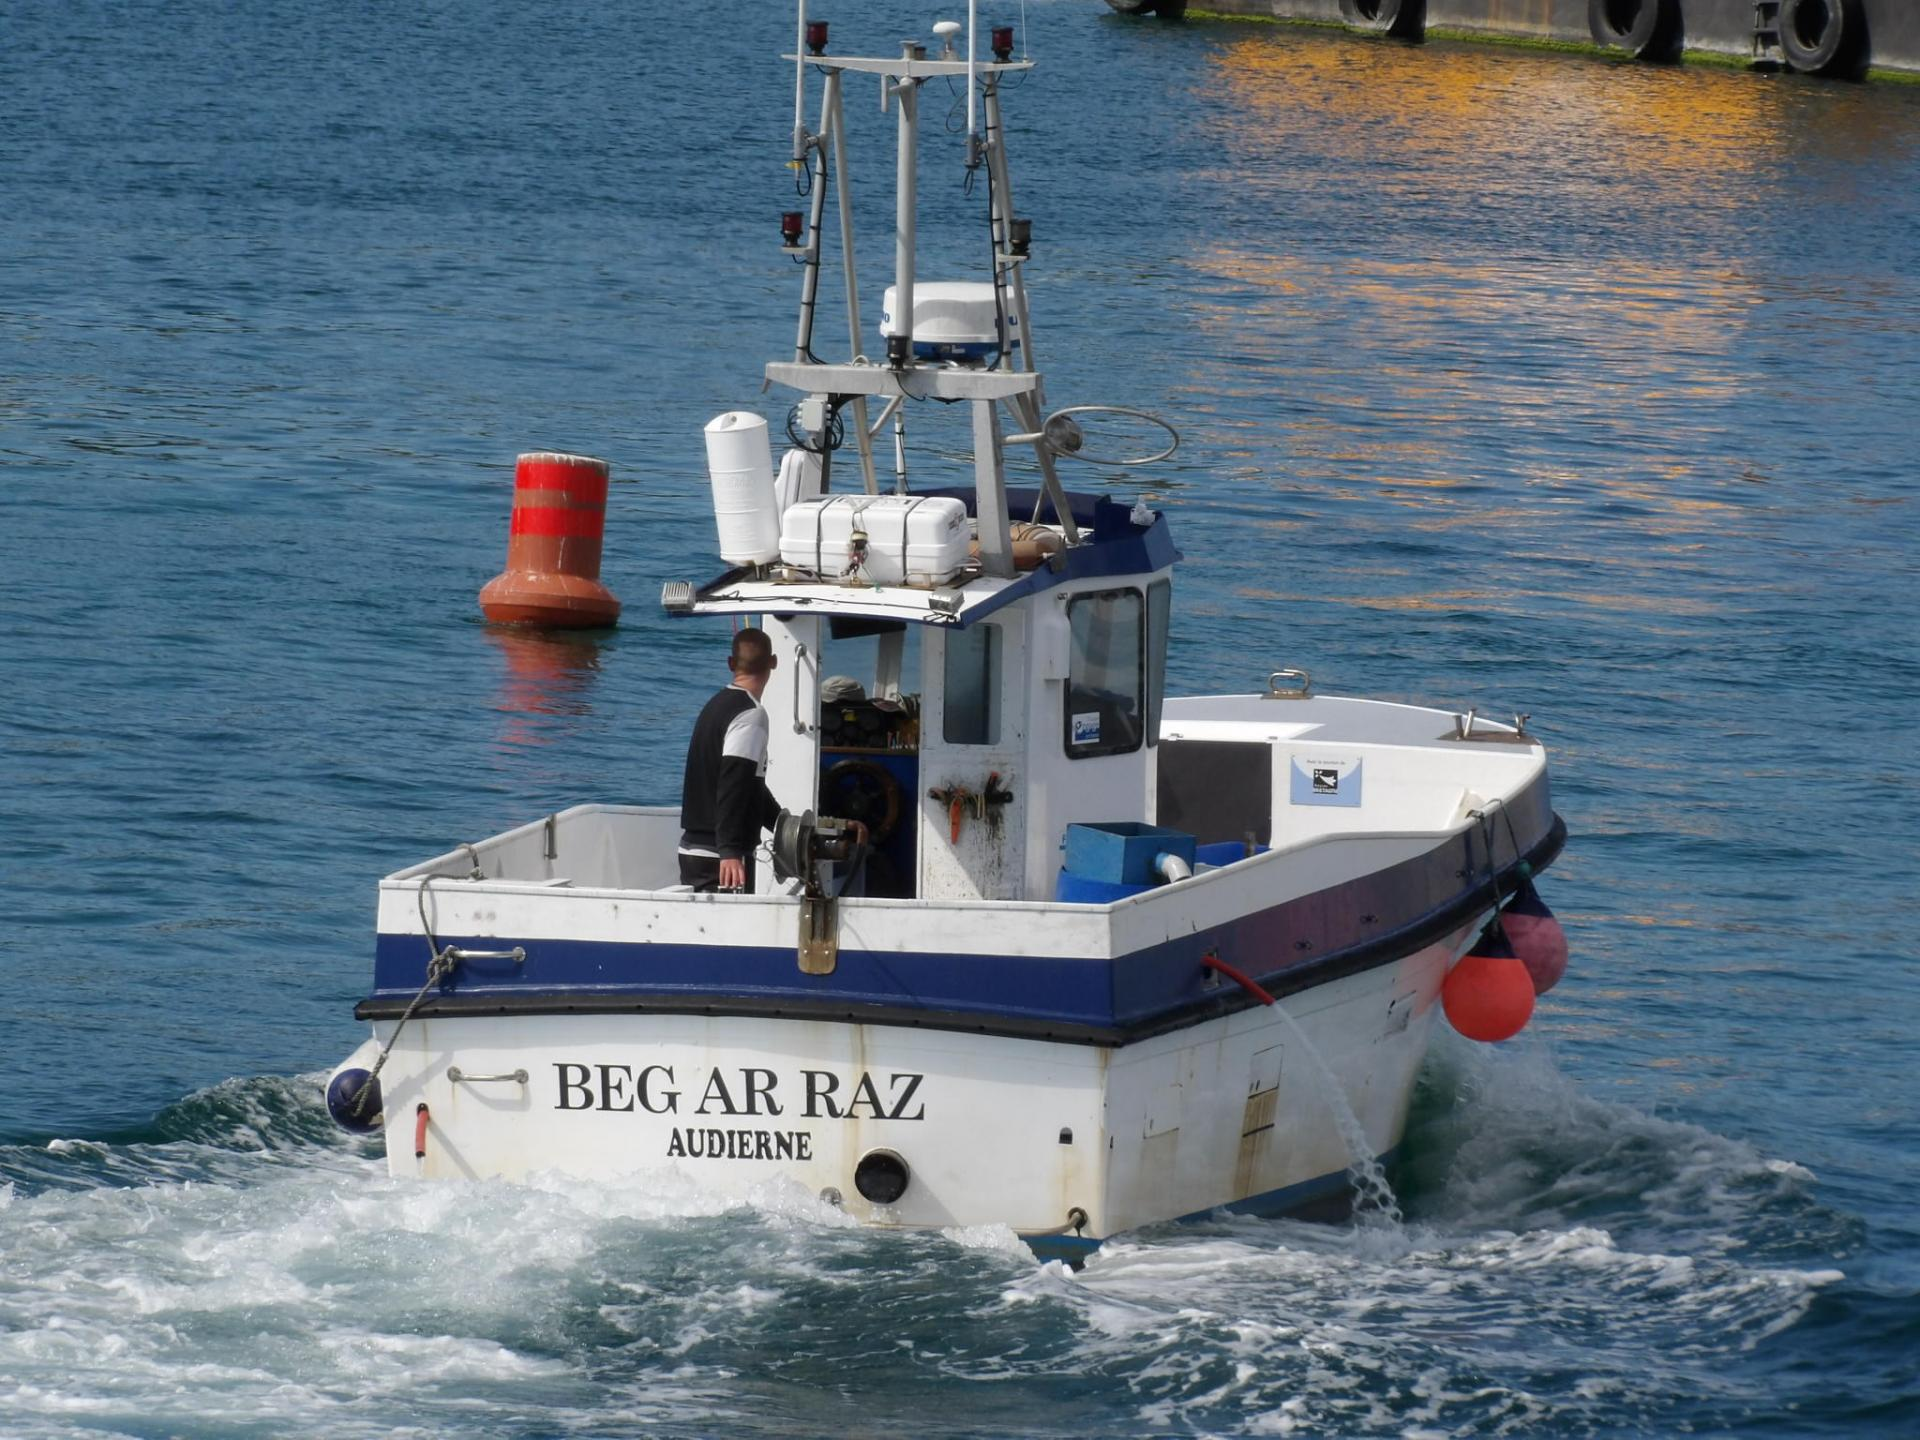 200901 beg ar raz retour ponton b